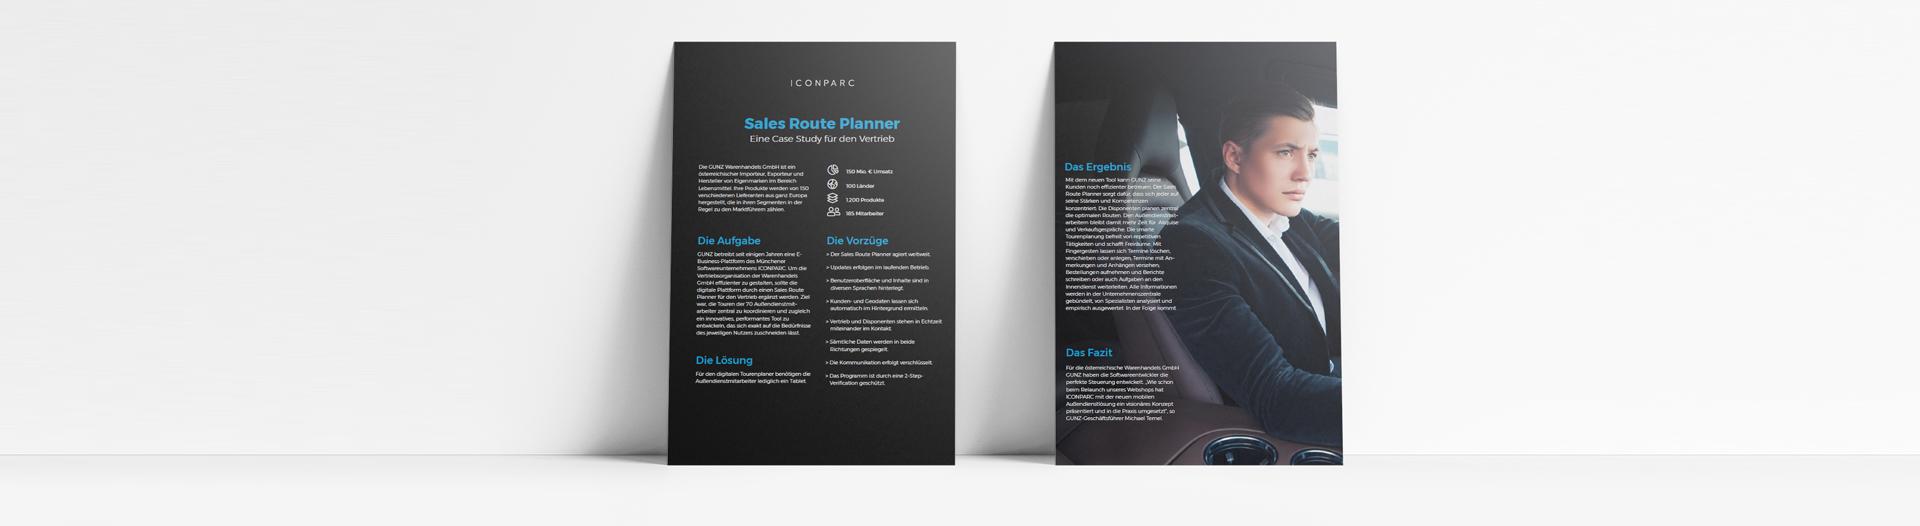 Case Study GUNZ Sales Route Planner